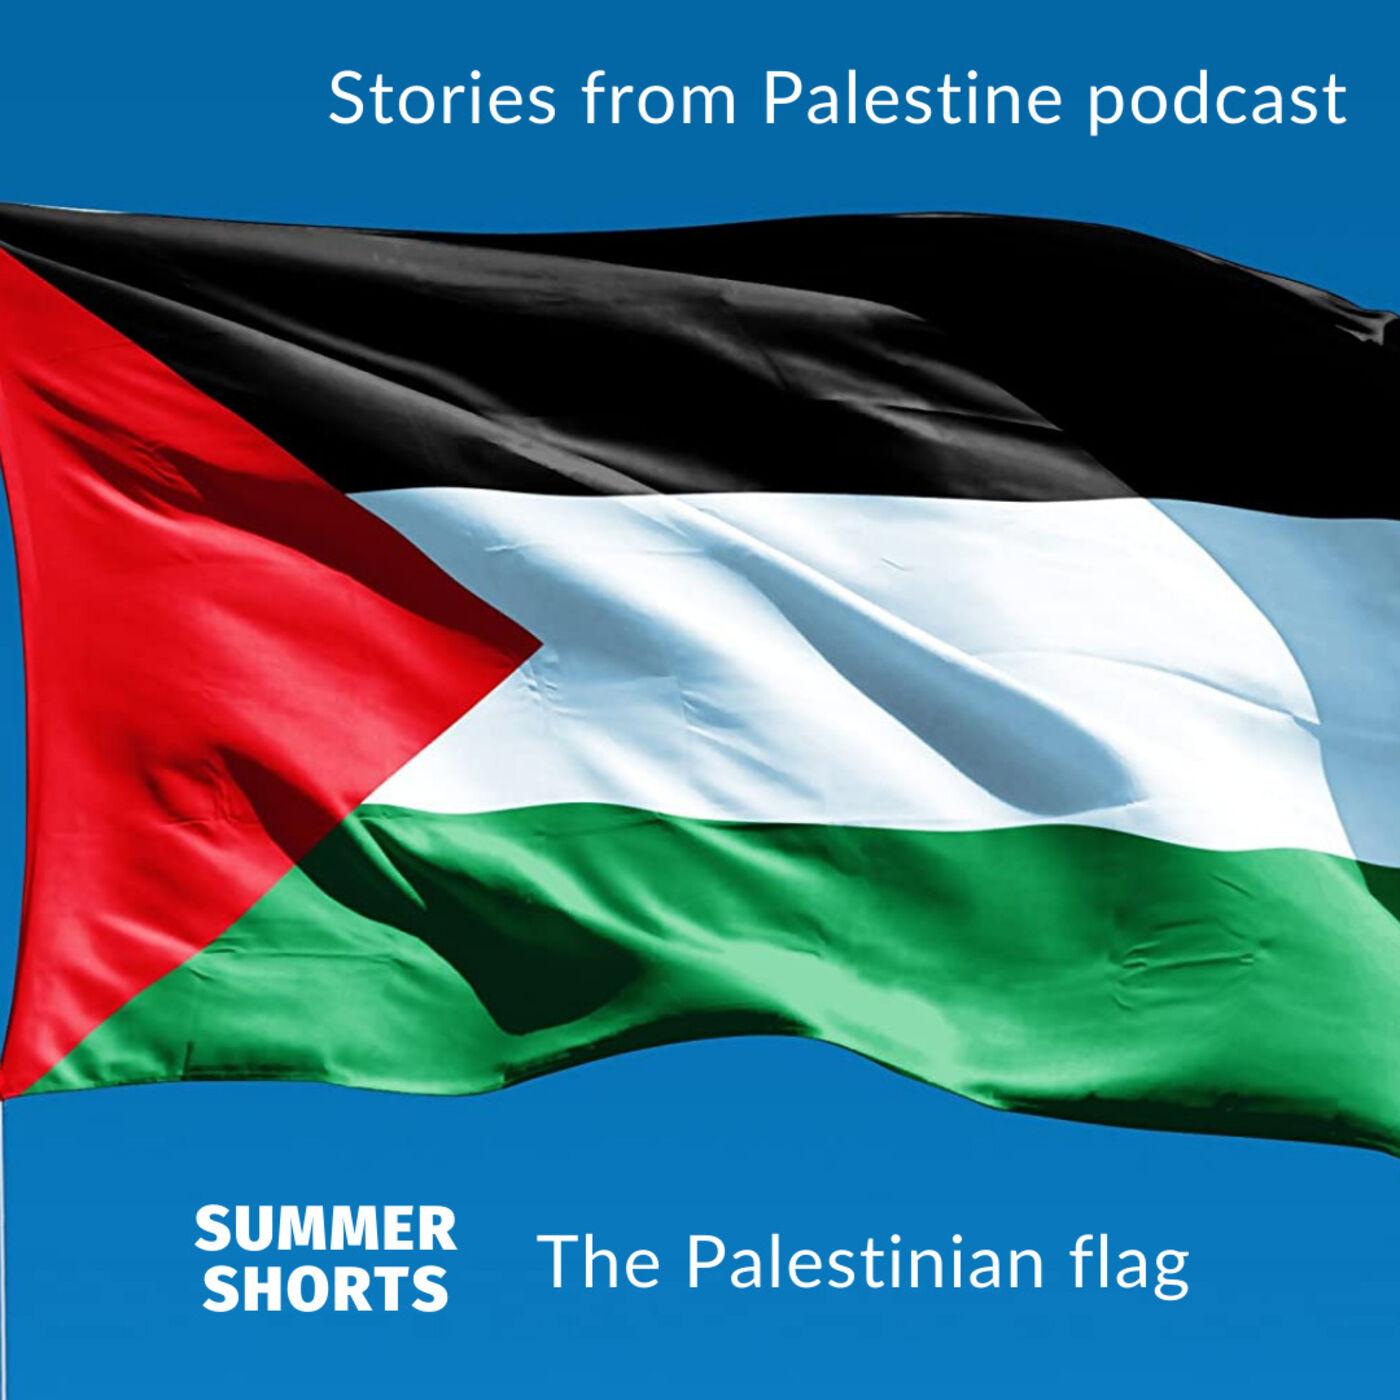 Summer shorts #1 The Palestinian flag